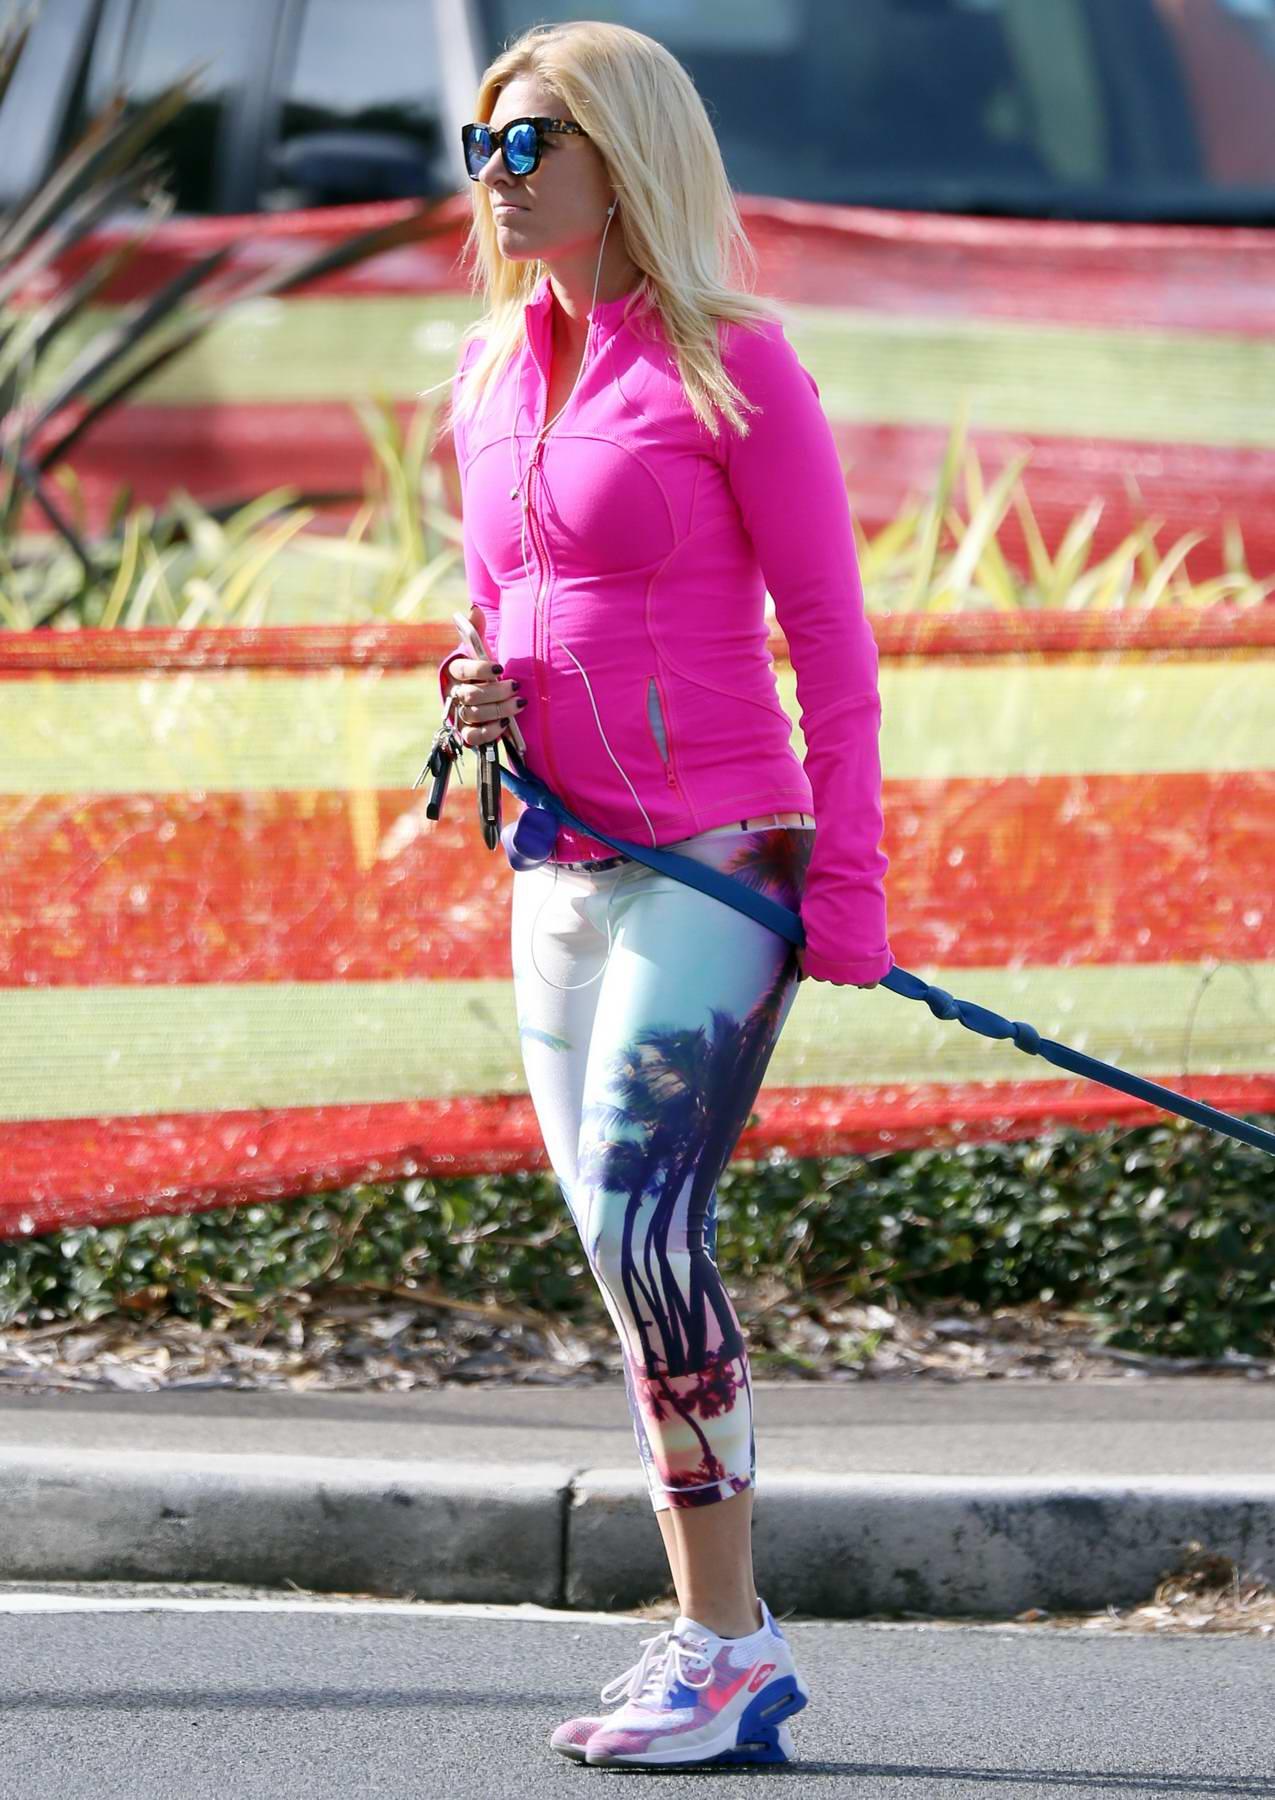 Anna Kooiman in Fluro Gym Wear walks her Dog in Bondi, Sydney